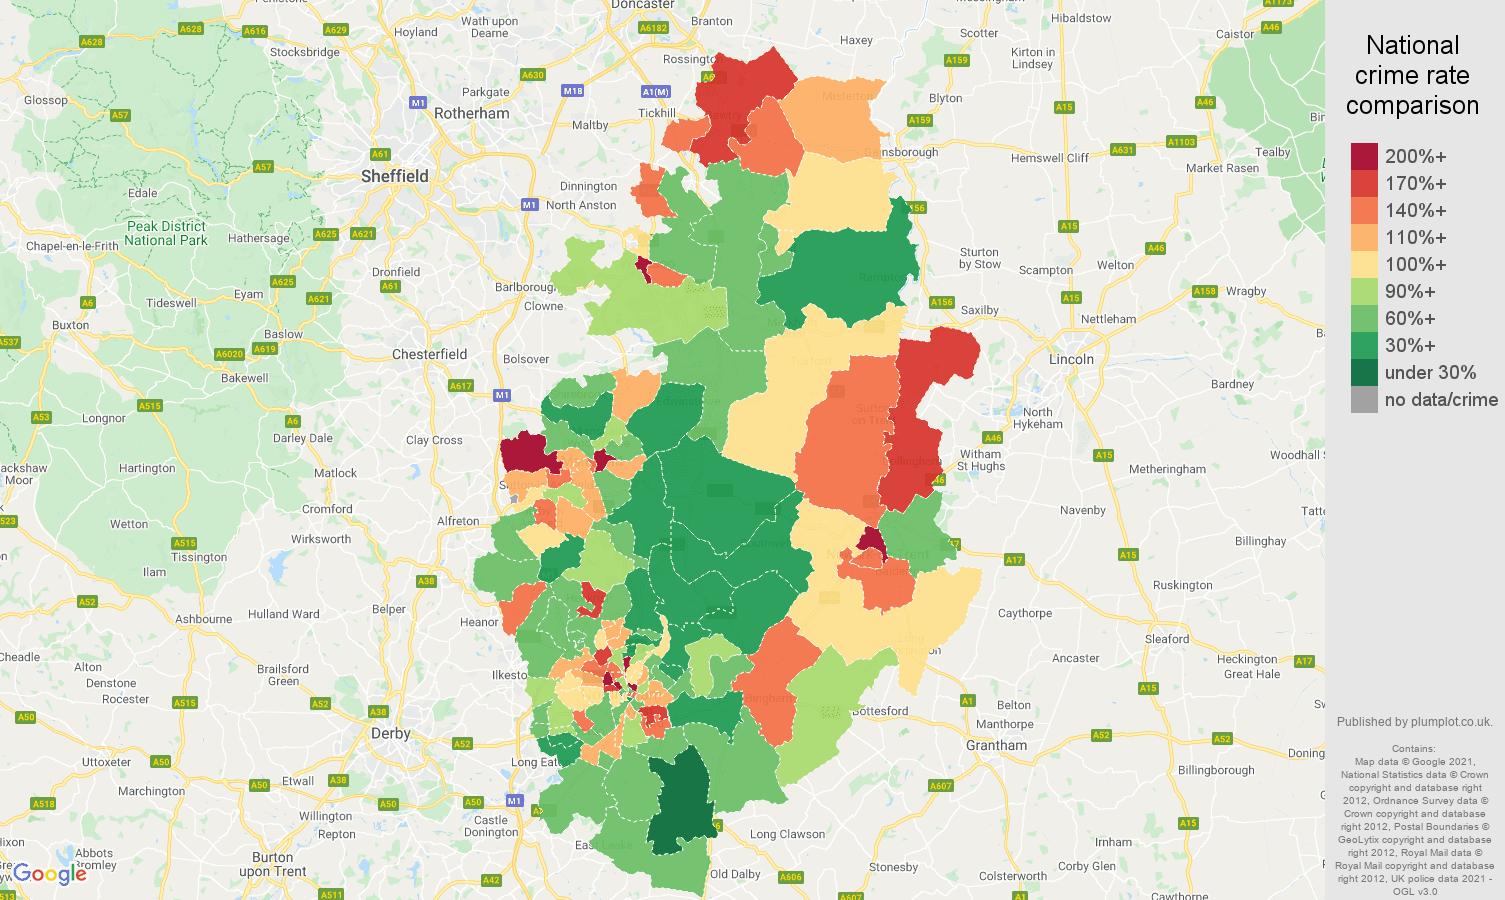 Nottinghamshire burglary crime rate comparison map